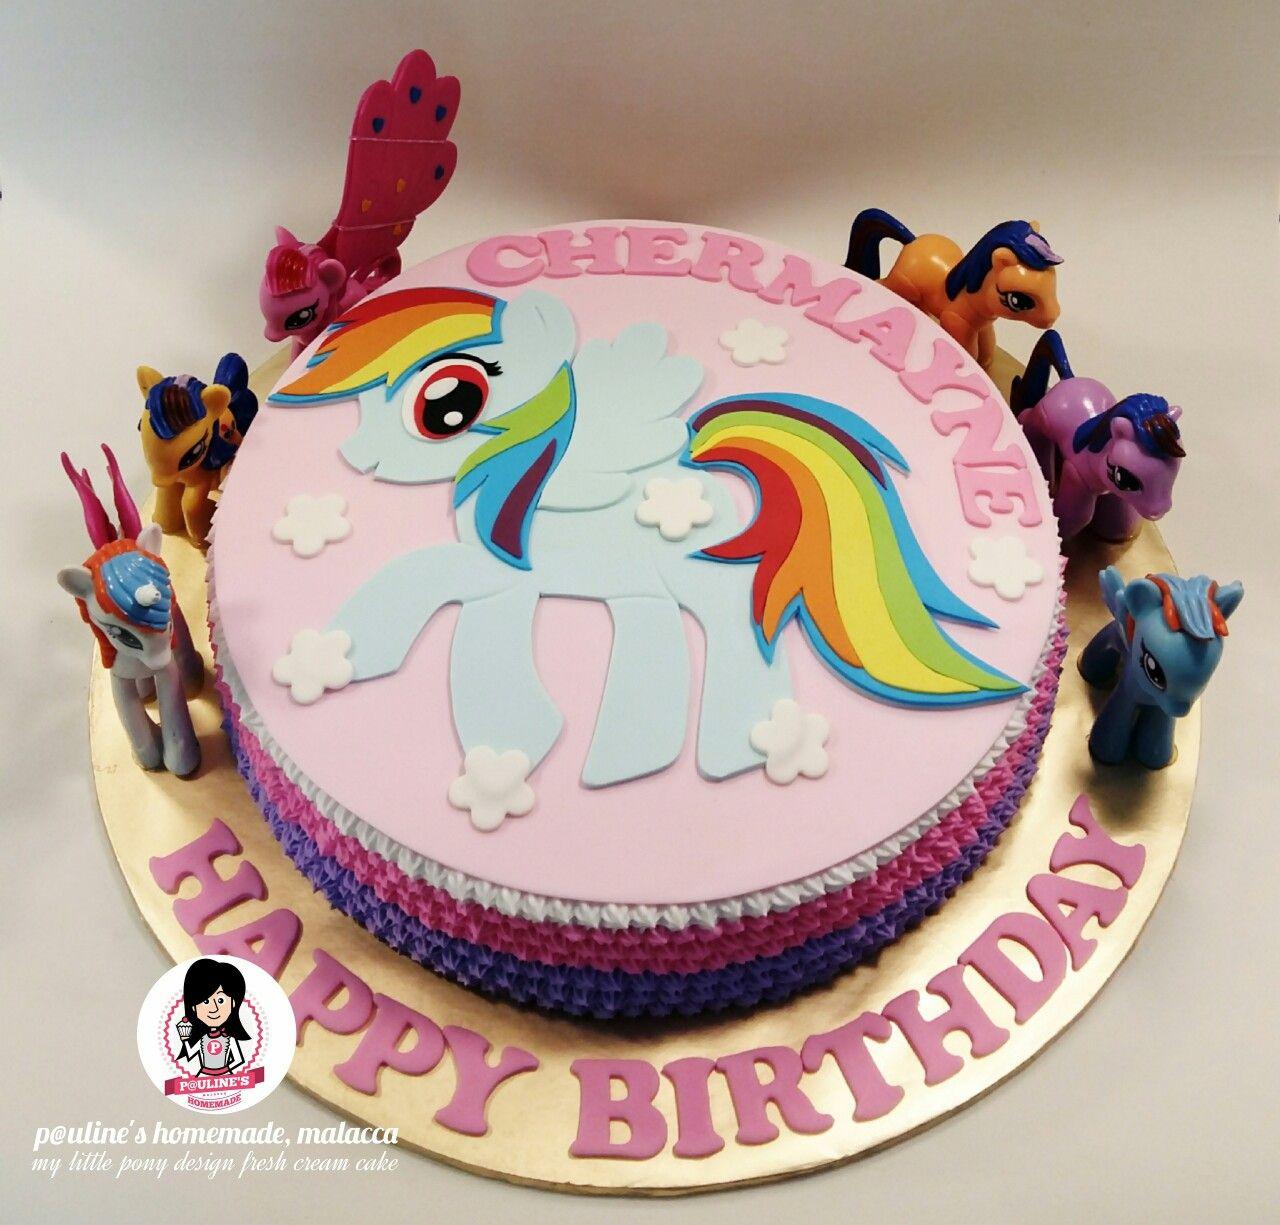 Rainbow Dash My Little Pony Design Fresh Cream Cake Little Pony Cake My Little Pony Cake Fresh Cream